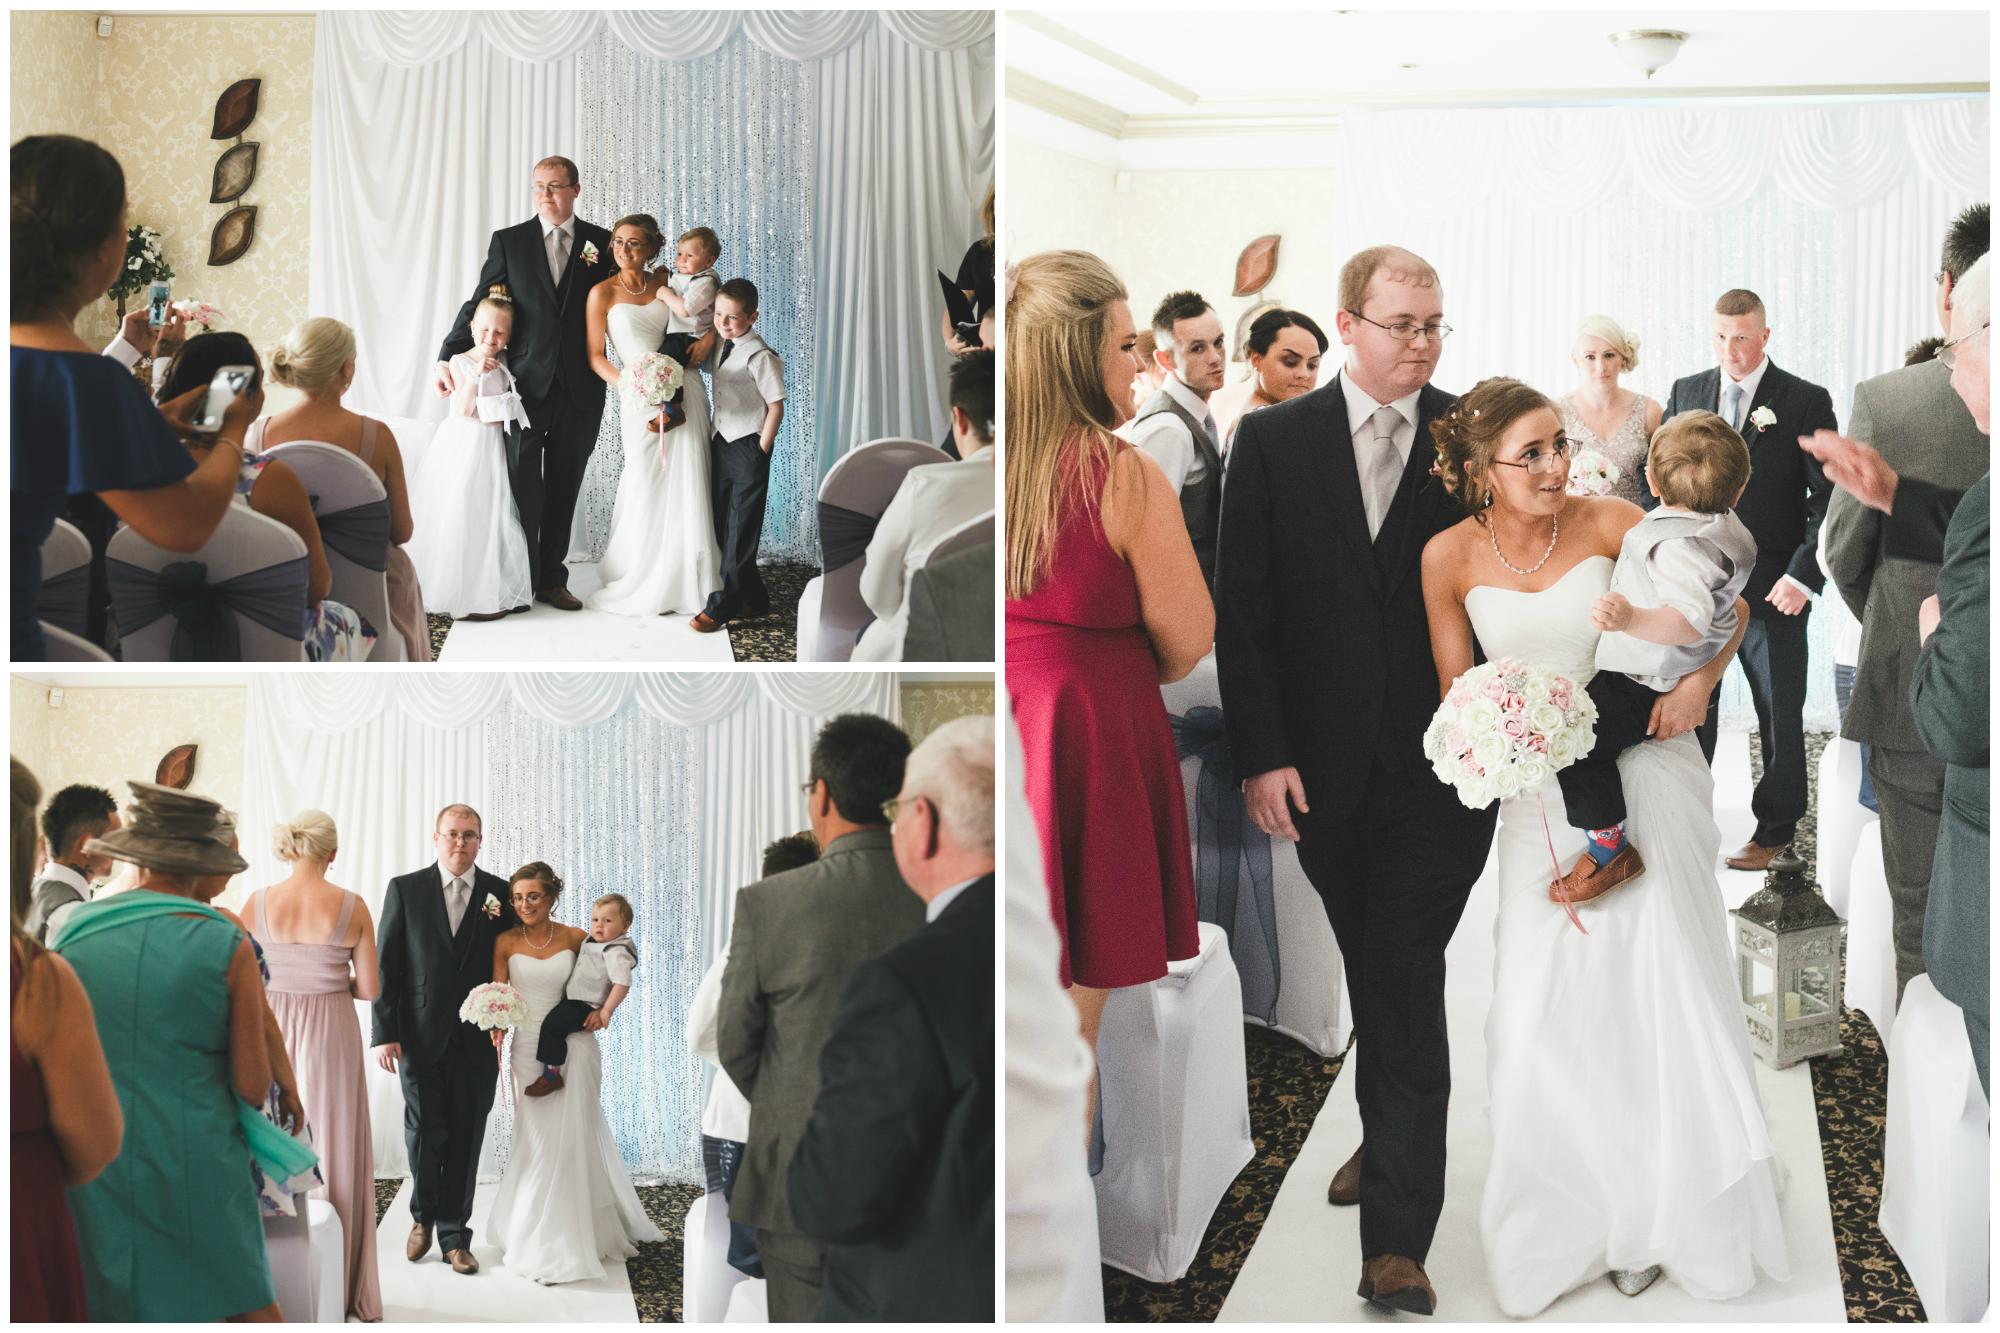 Ballymac_hotel_wedding_lisburn_shoes_bride_groom_leave_ceremony